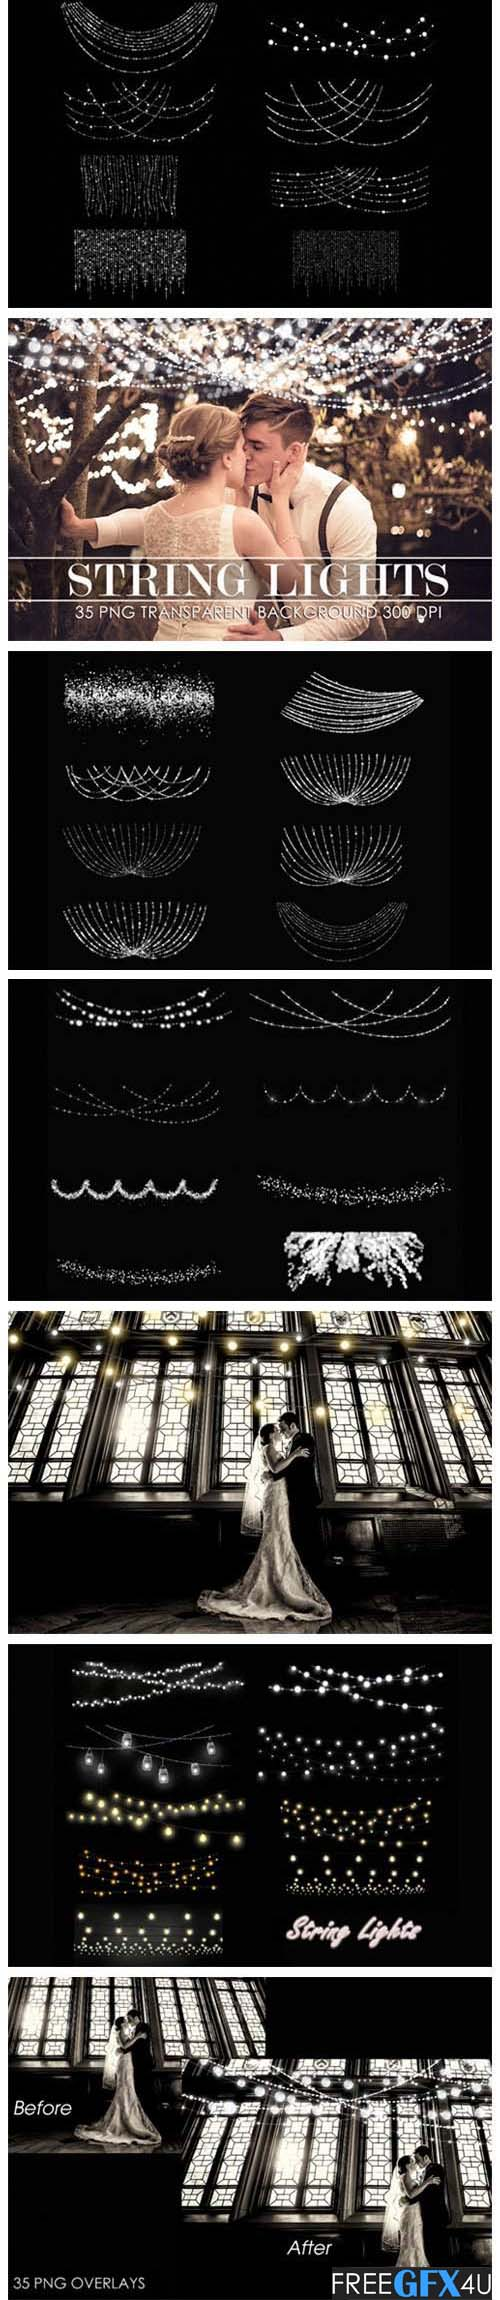 35 String Lights Overlay Pack